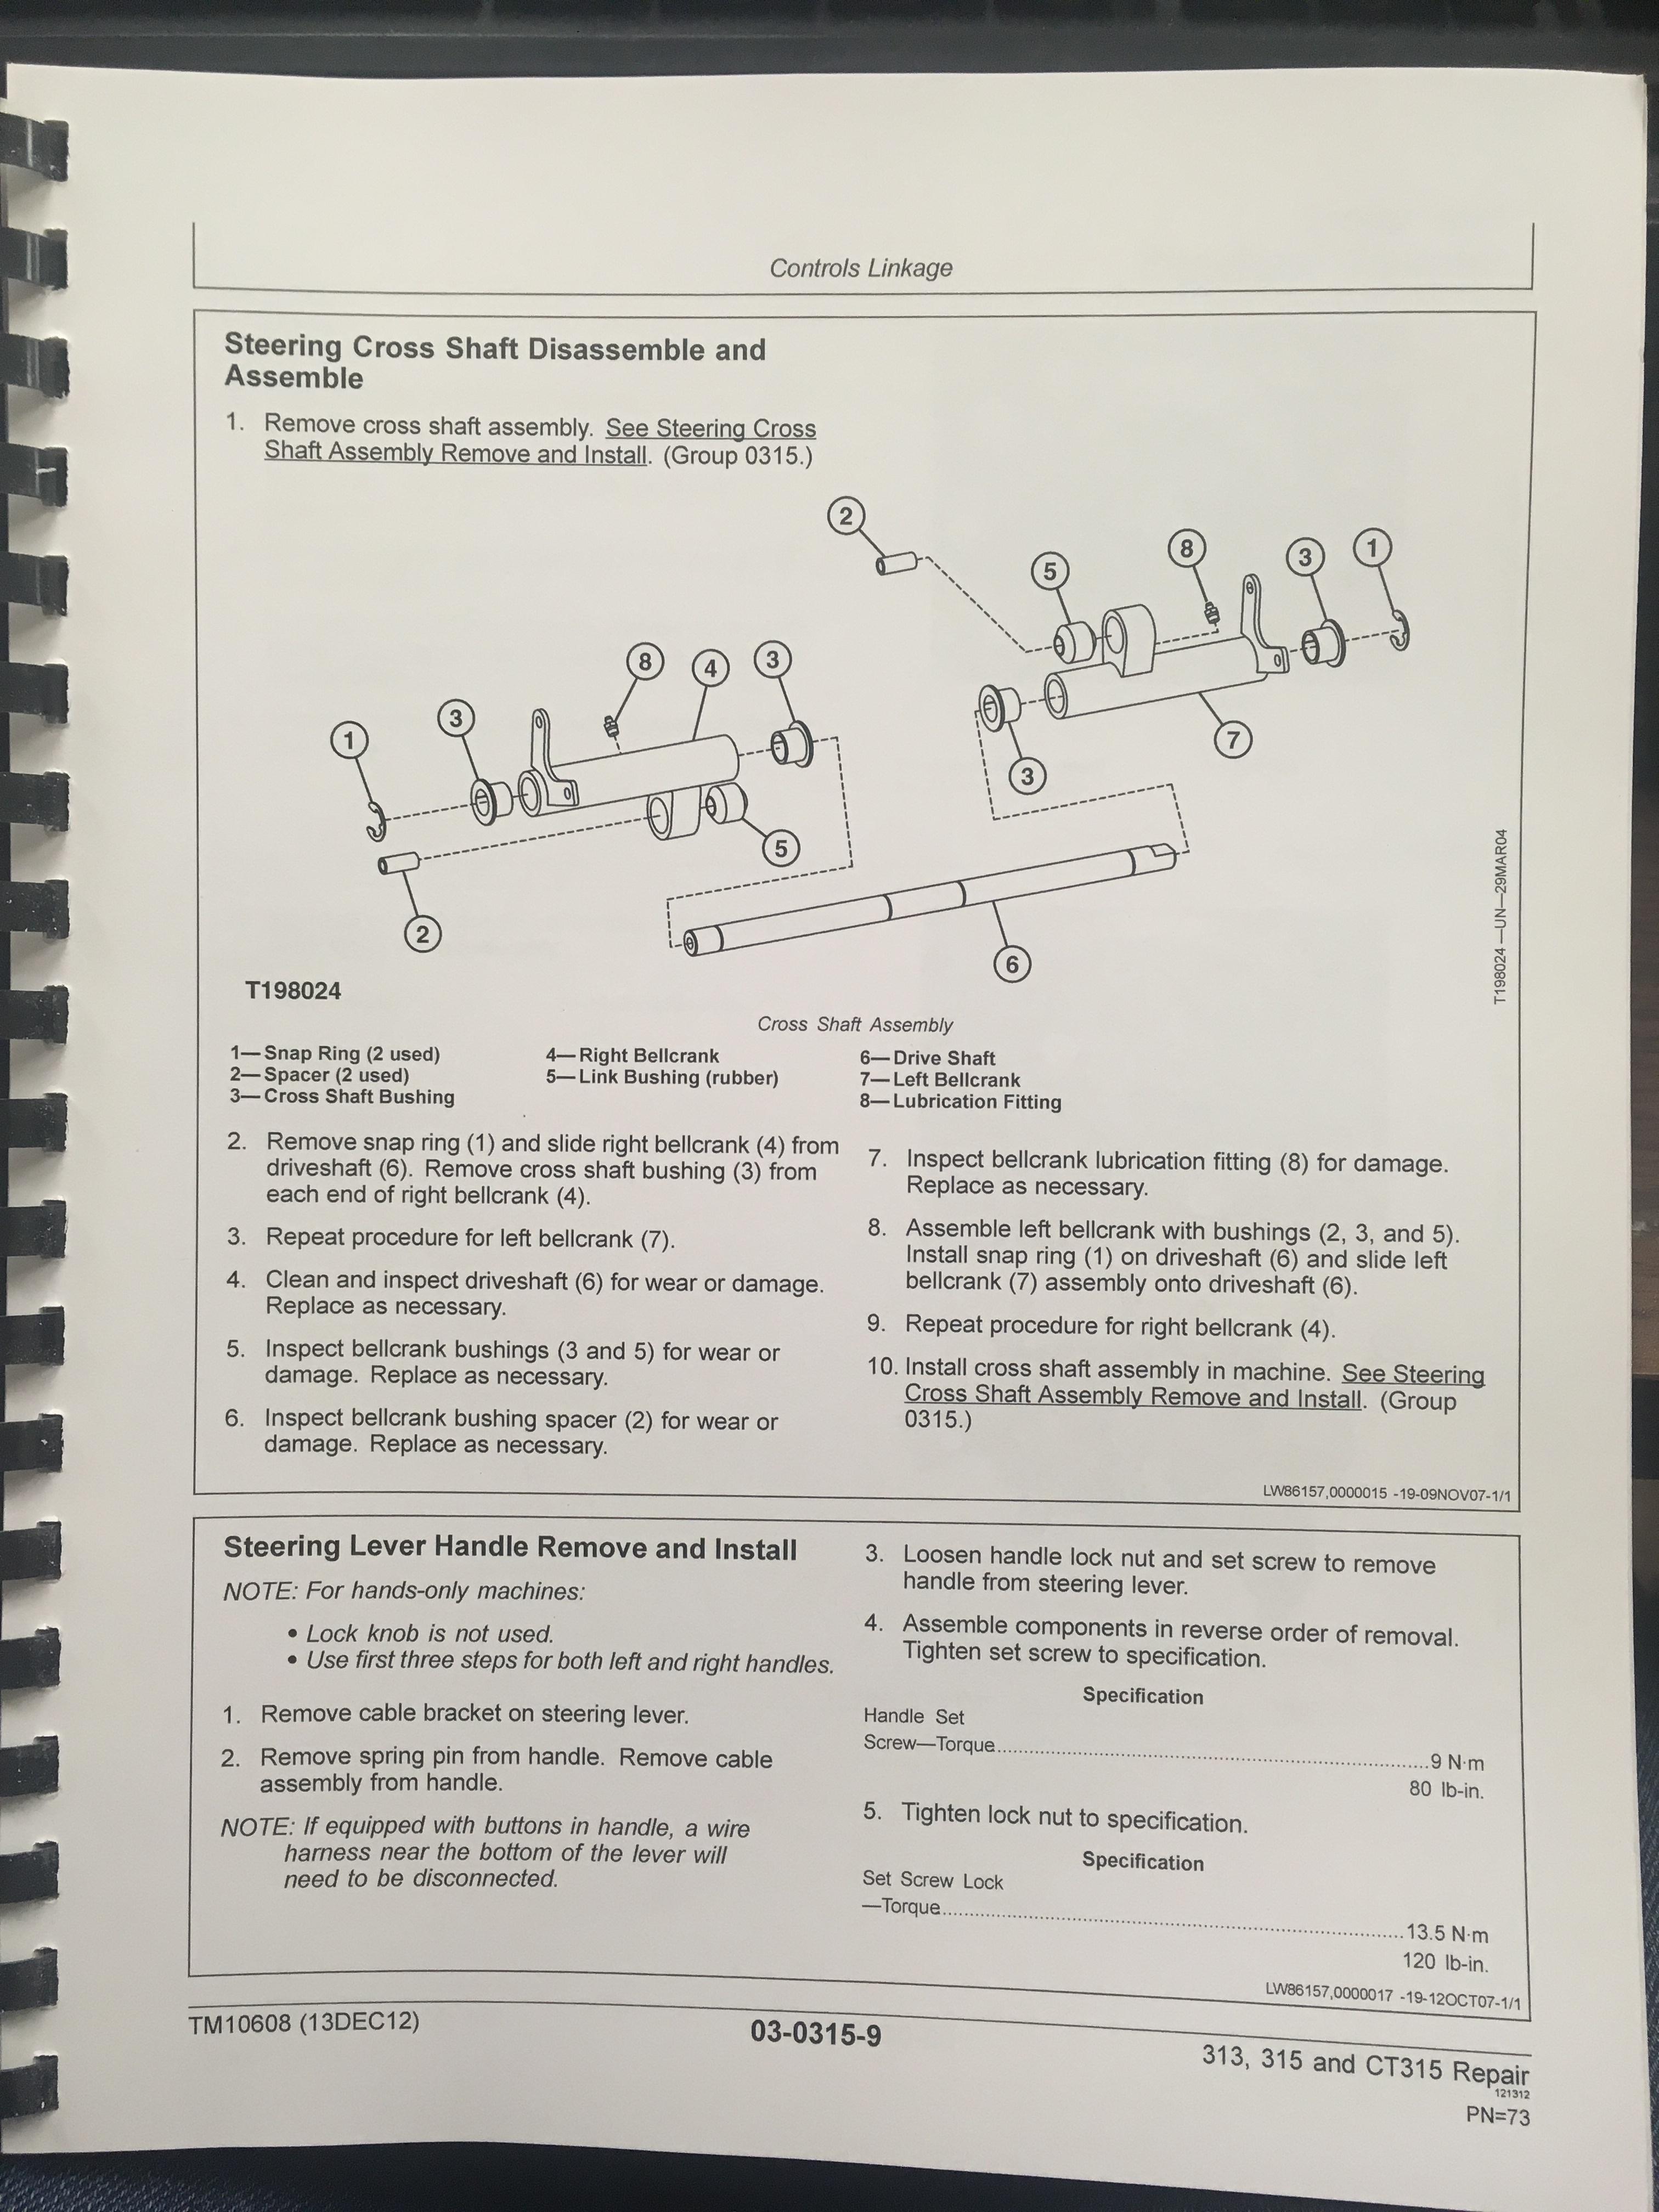 John Deere 313 315 Skid Steer CT315 Compact Track Loader Technical Manual  JD TM10608 Book